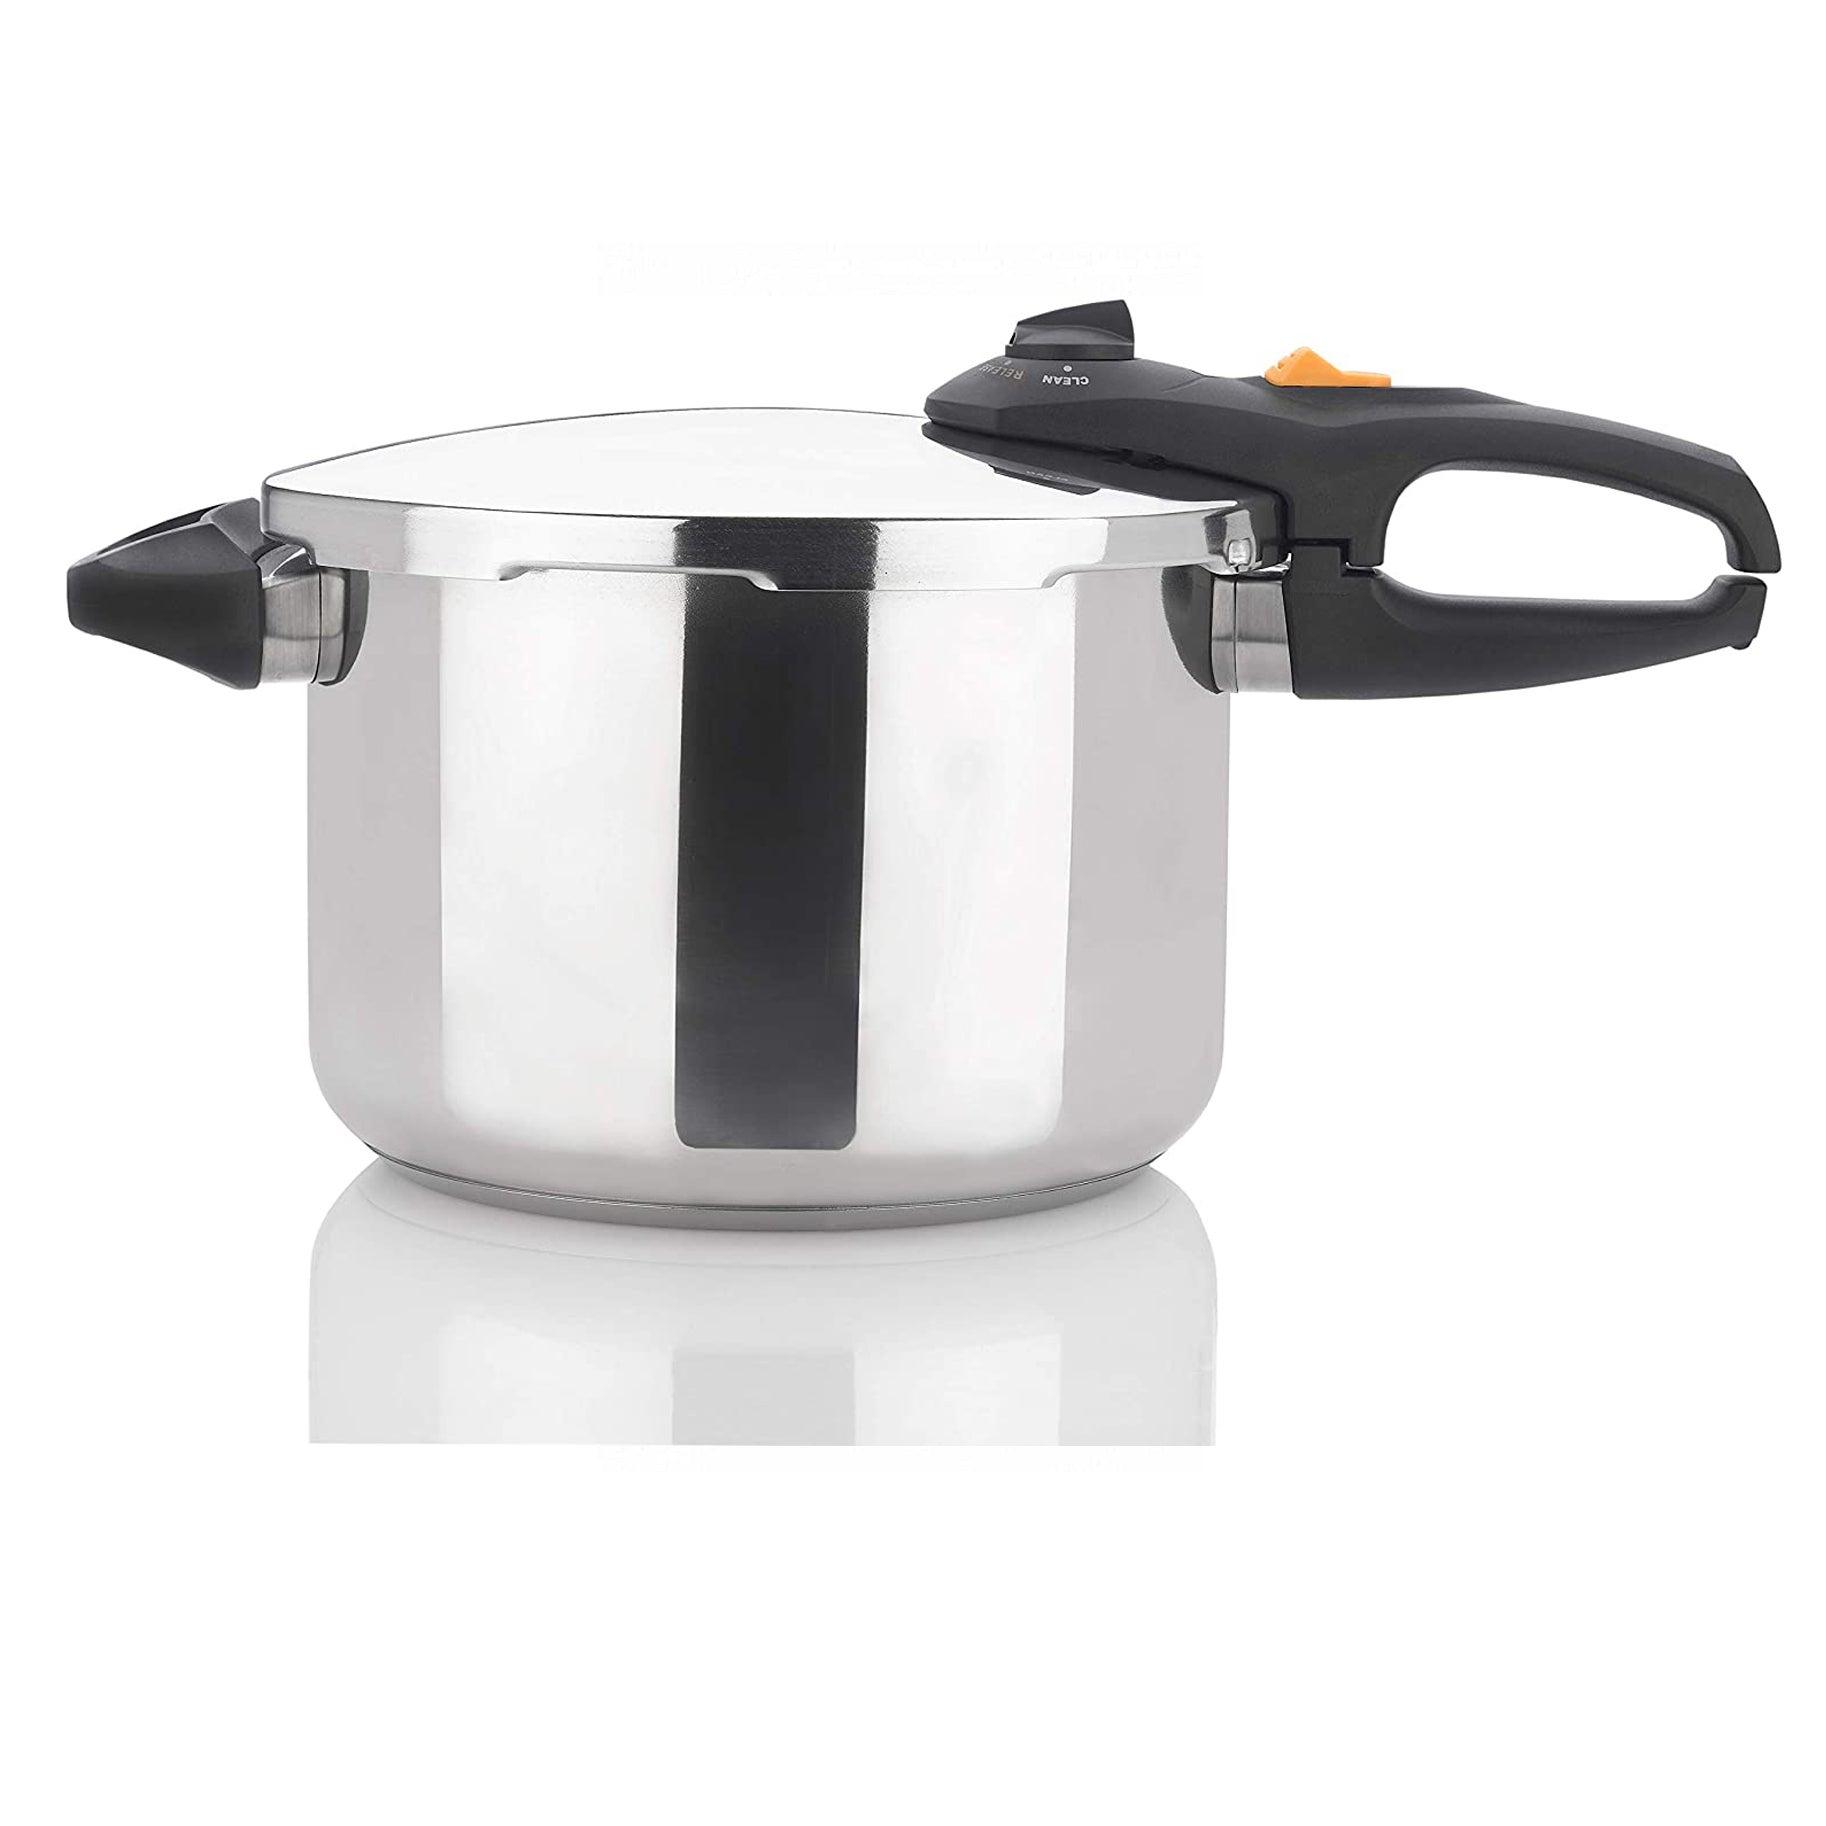 The Best Pressure Cooker Option: Zavor DUO 8.4 Quart Pressure Cooker